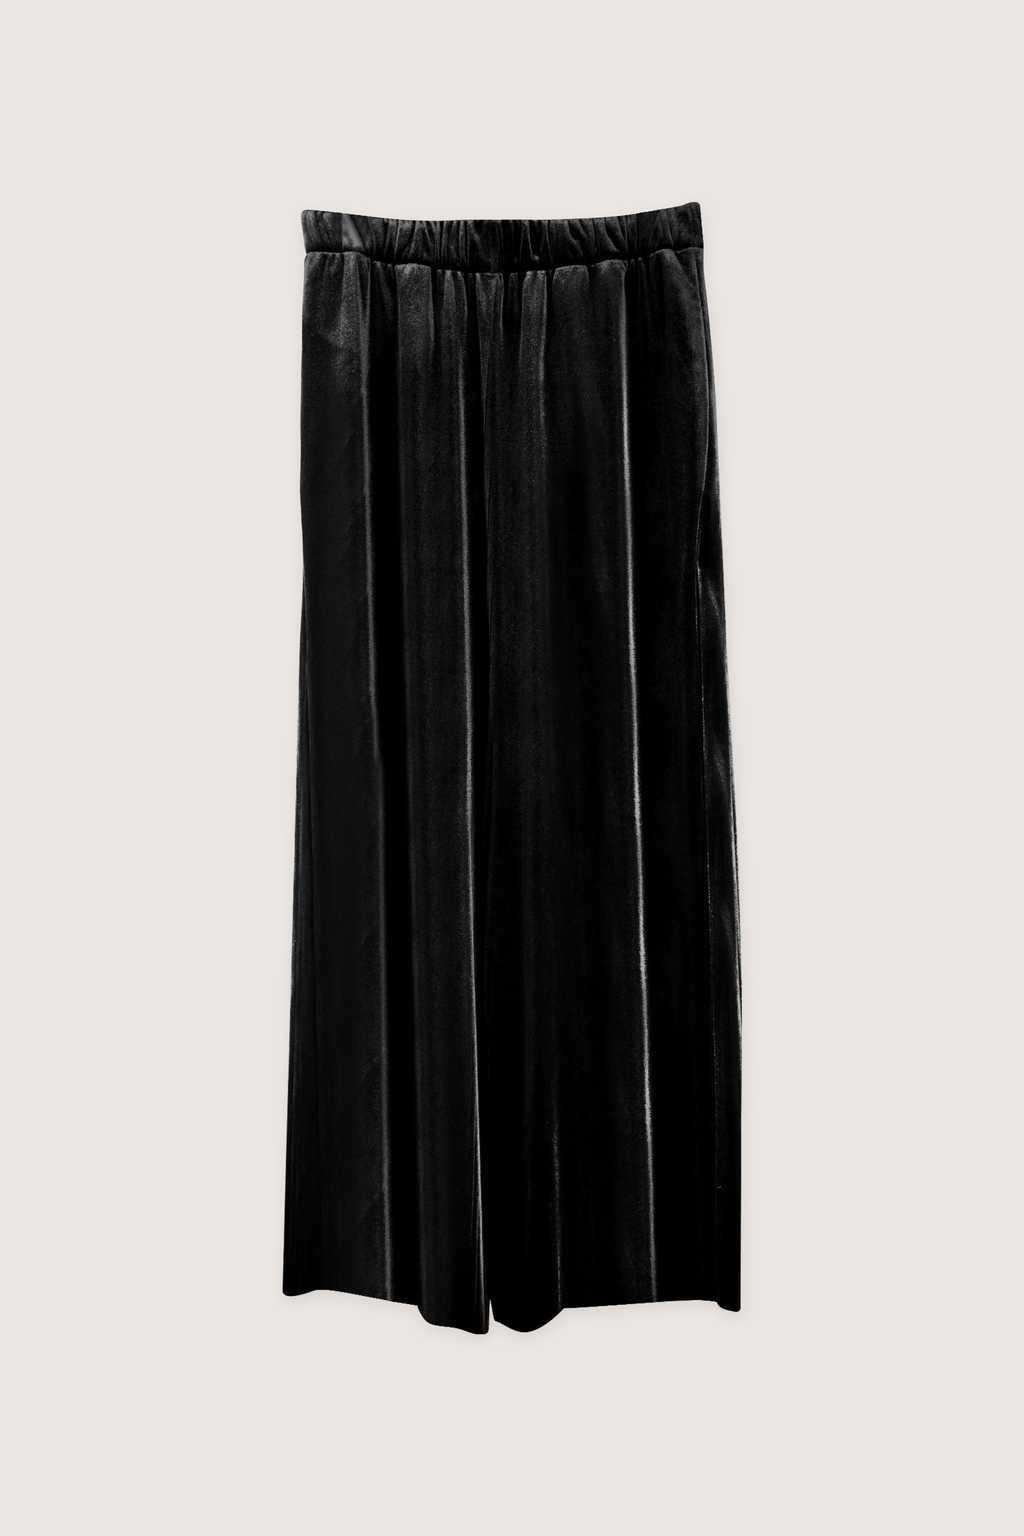 Pant 1560 Black 9